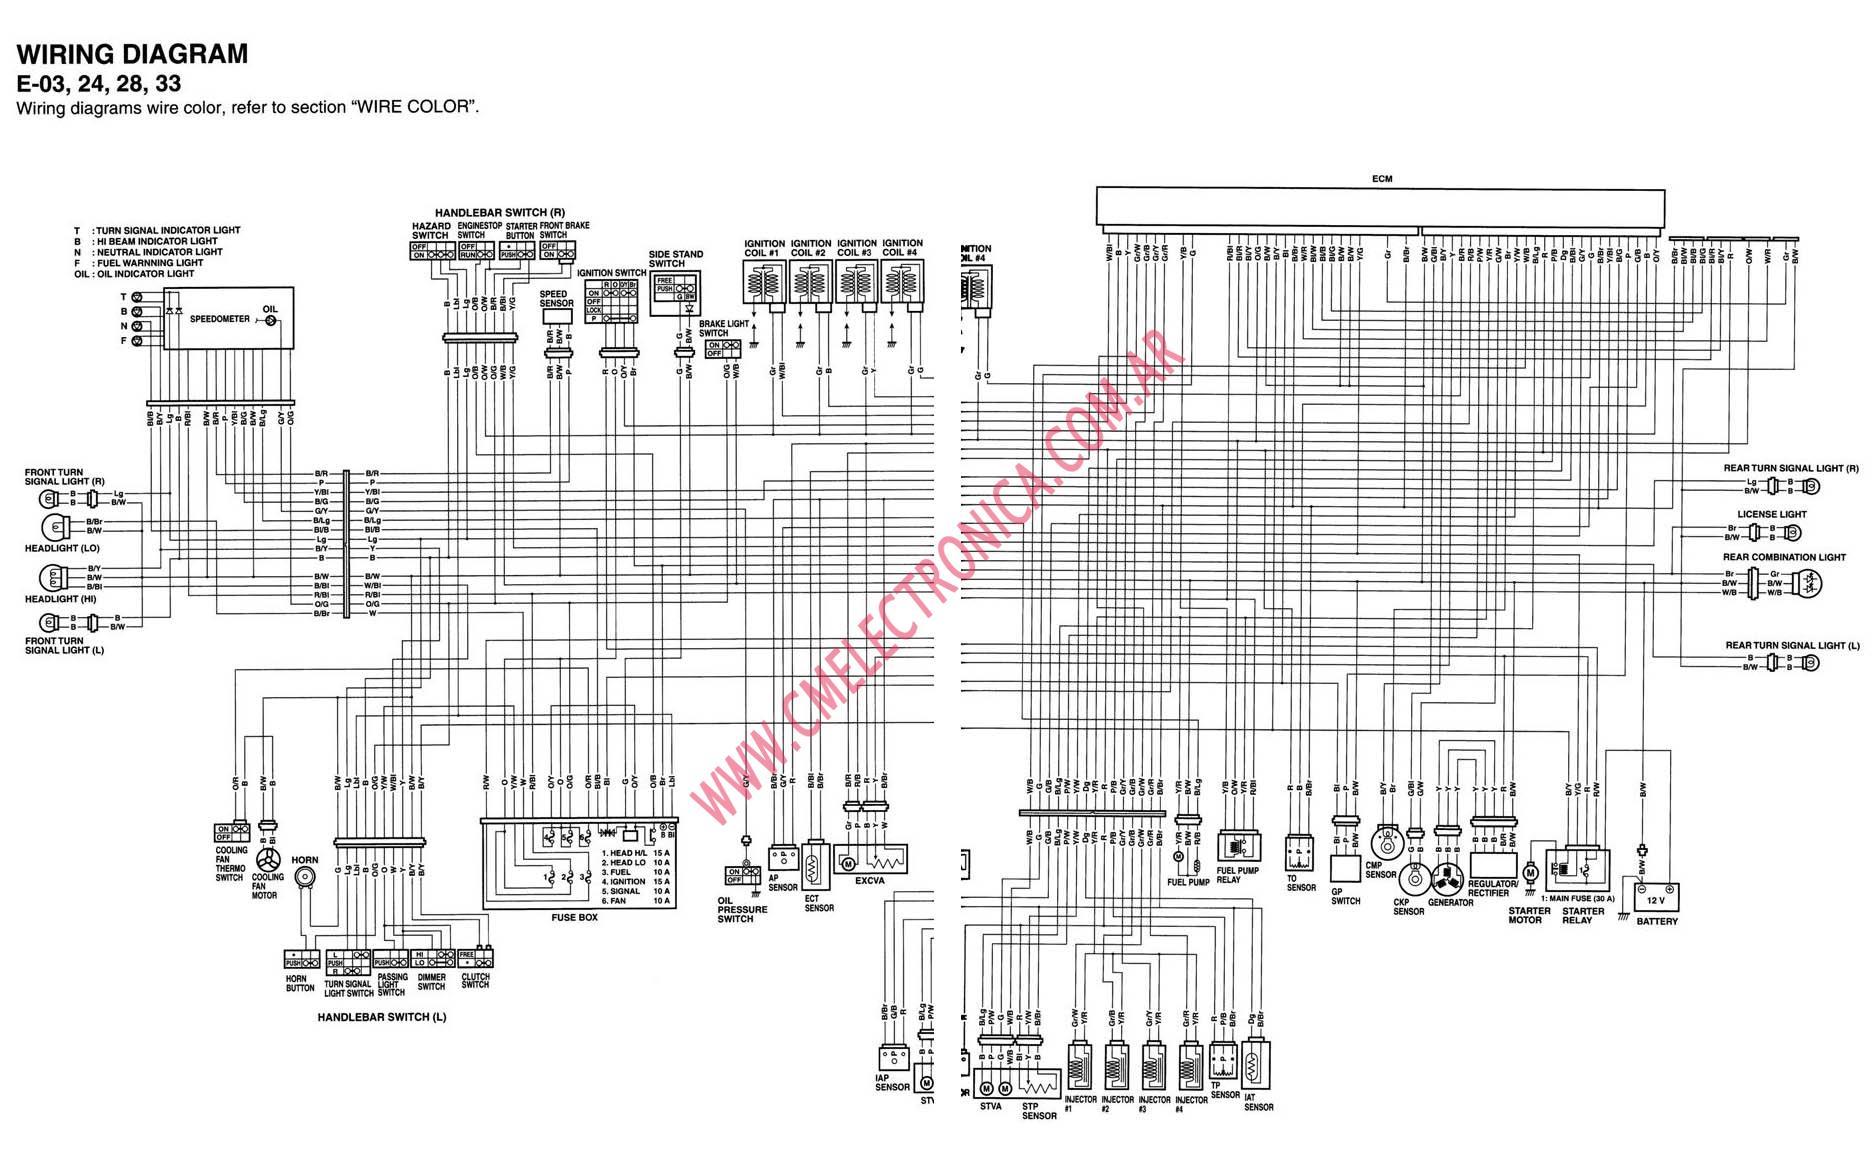 2004 Fz6 Wiring Diagram Block Explanation Yamaha Rear Suspension Elsalvadorla Street Fighter Guage